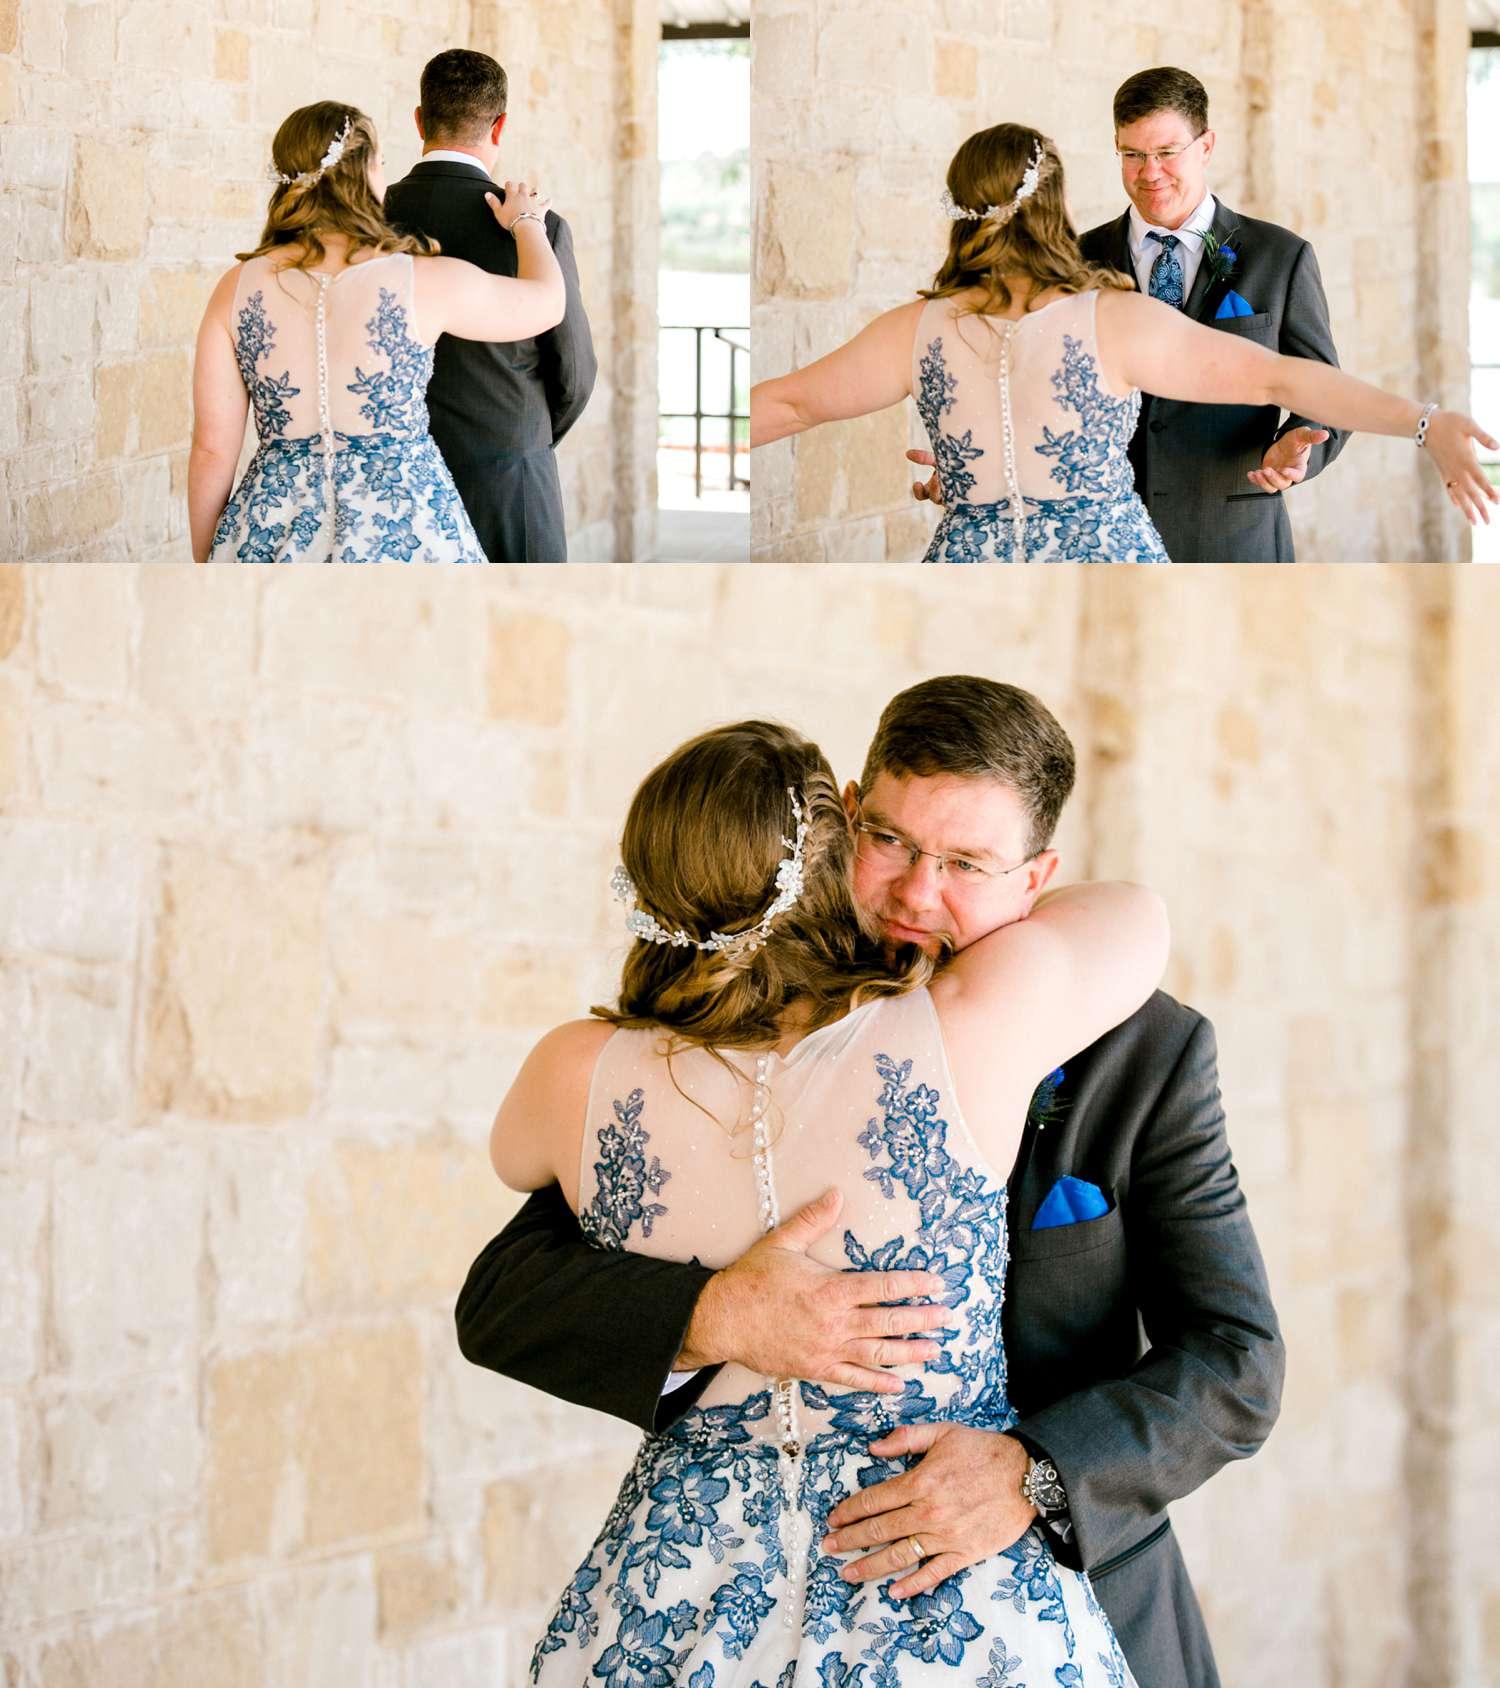 TY+NATHAN+HALLIER+ALLEEJ+WEDDING+PHOTOGRAPHER+RANSOM+CANYON_0019.jpg